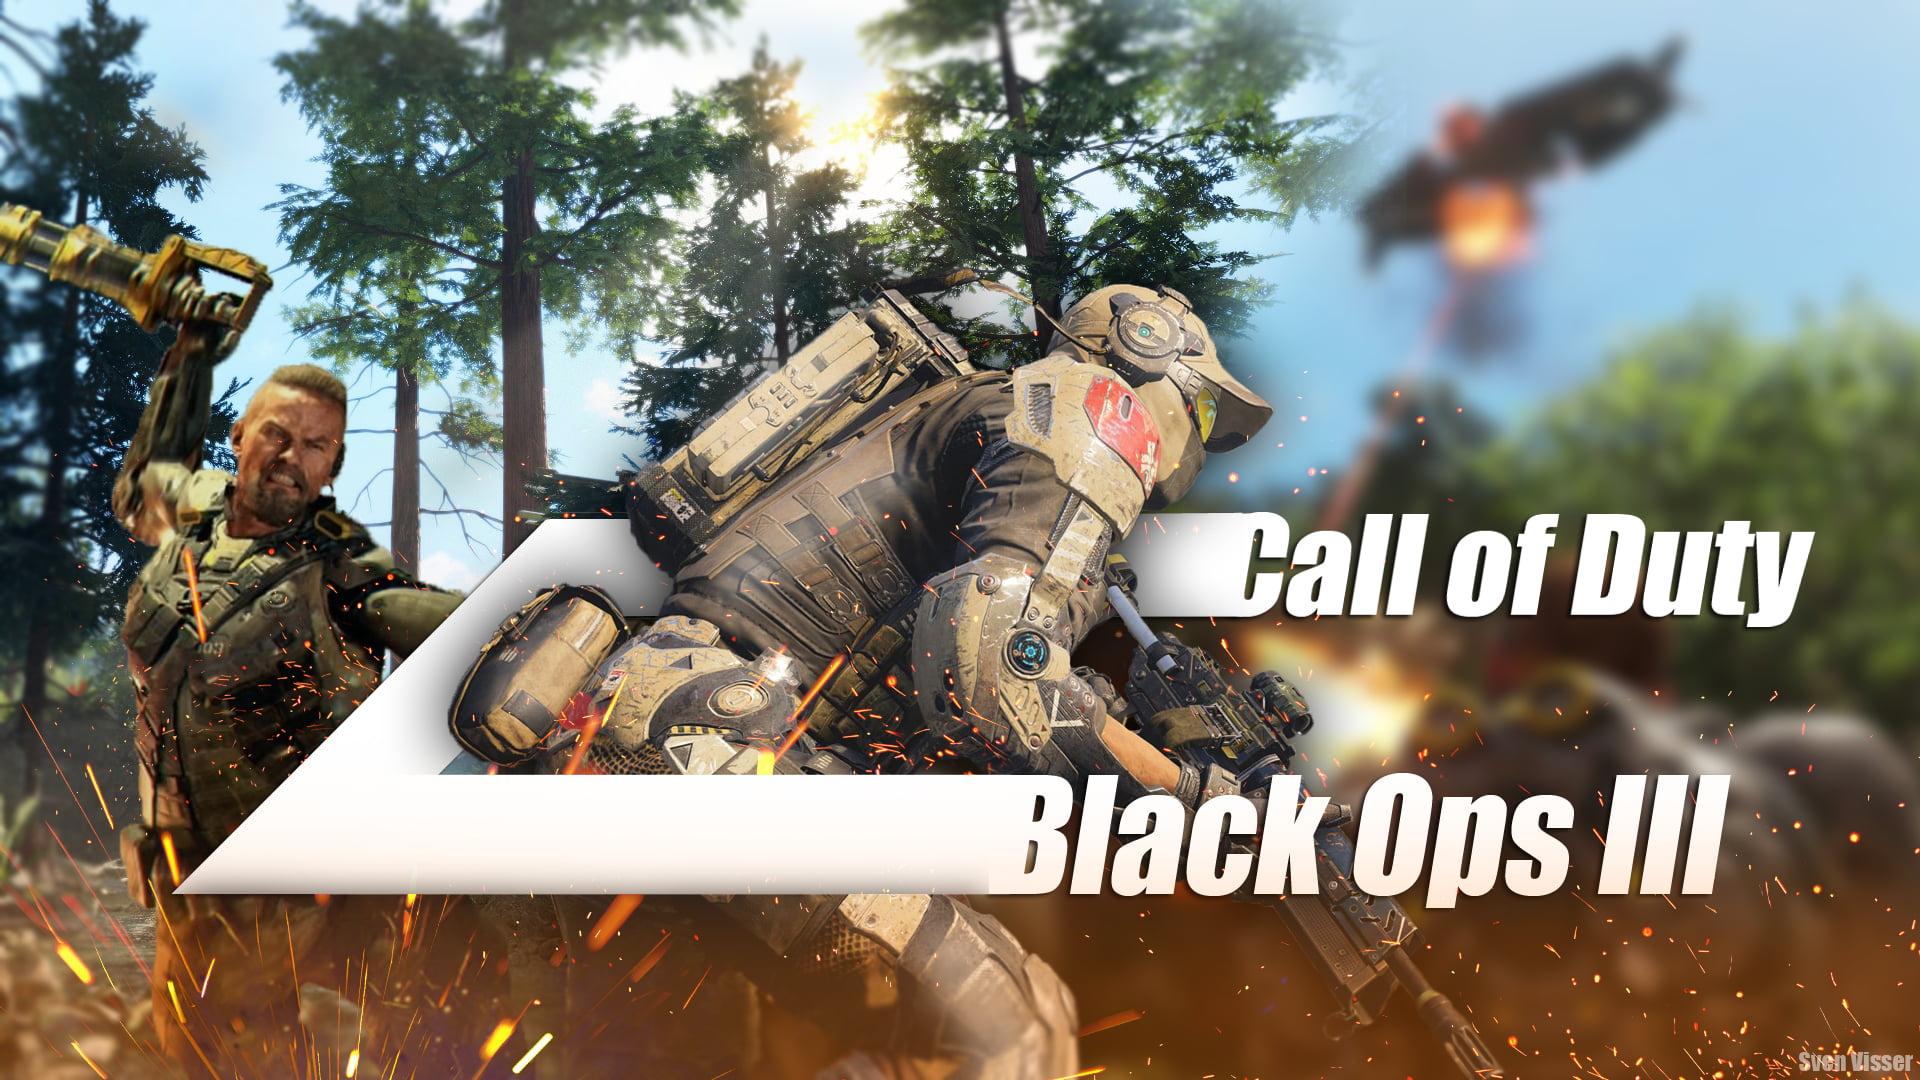 Cod Black Ops 3 Backgrounds - HD Wallpaper